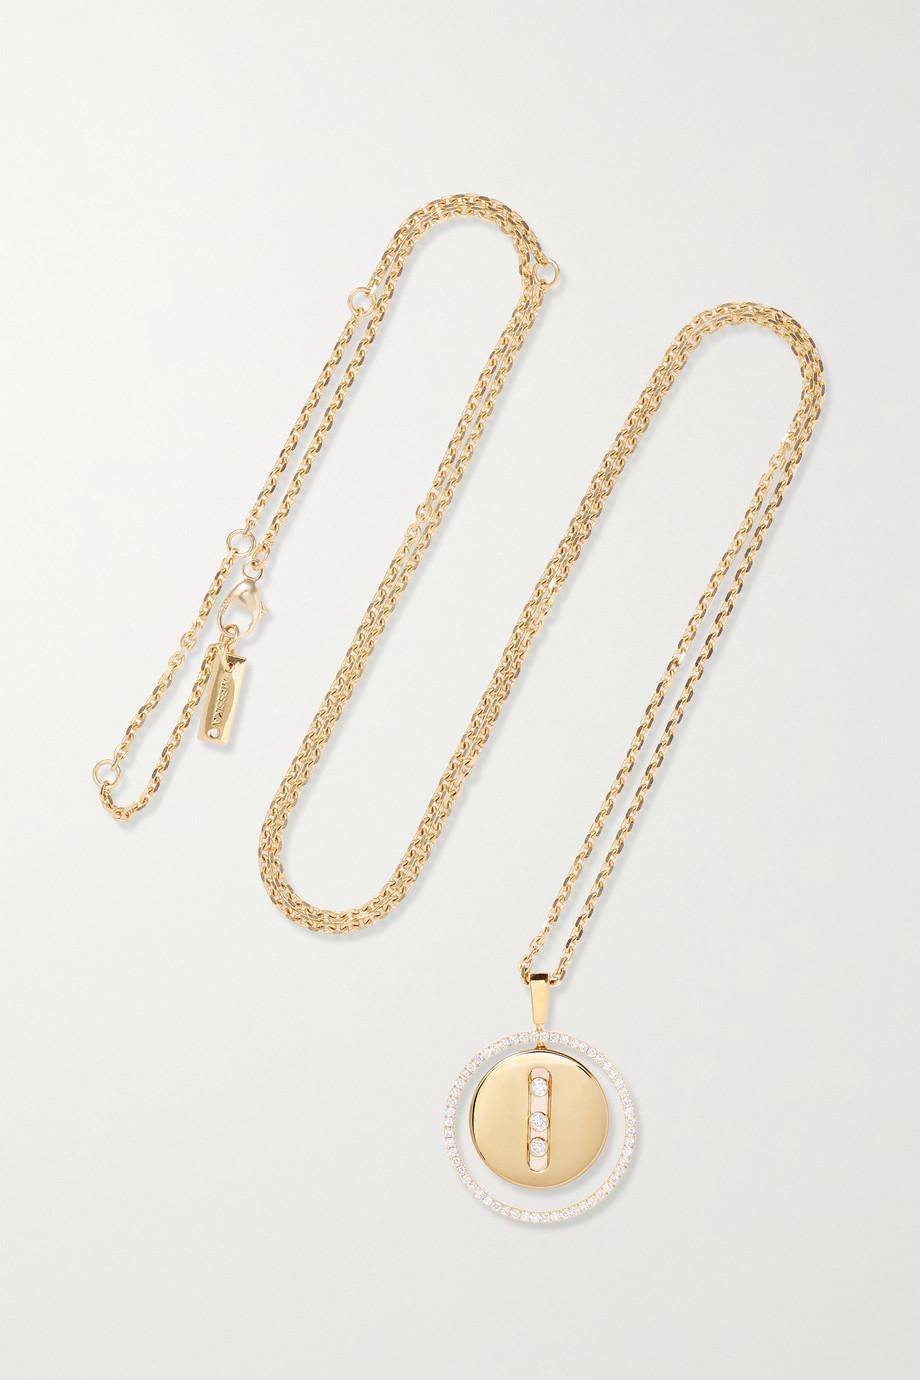 Messika Collier en or 18 carats et diamants Lucky Move